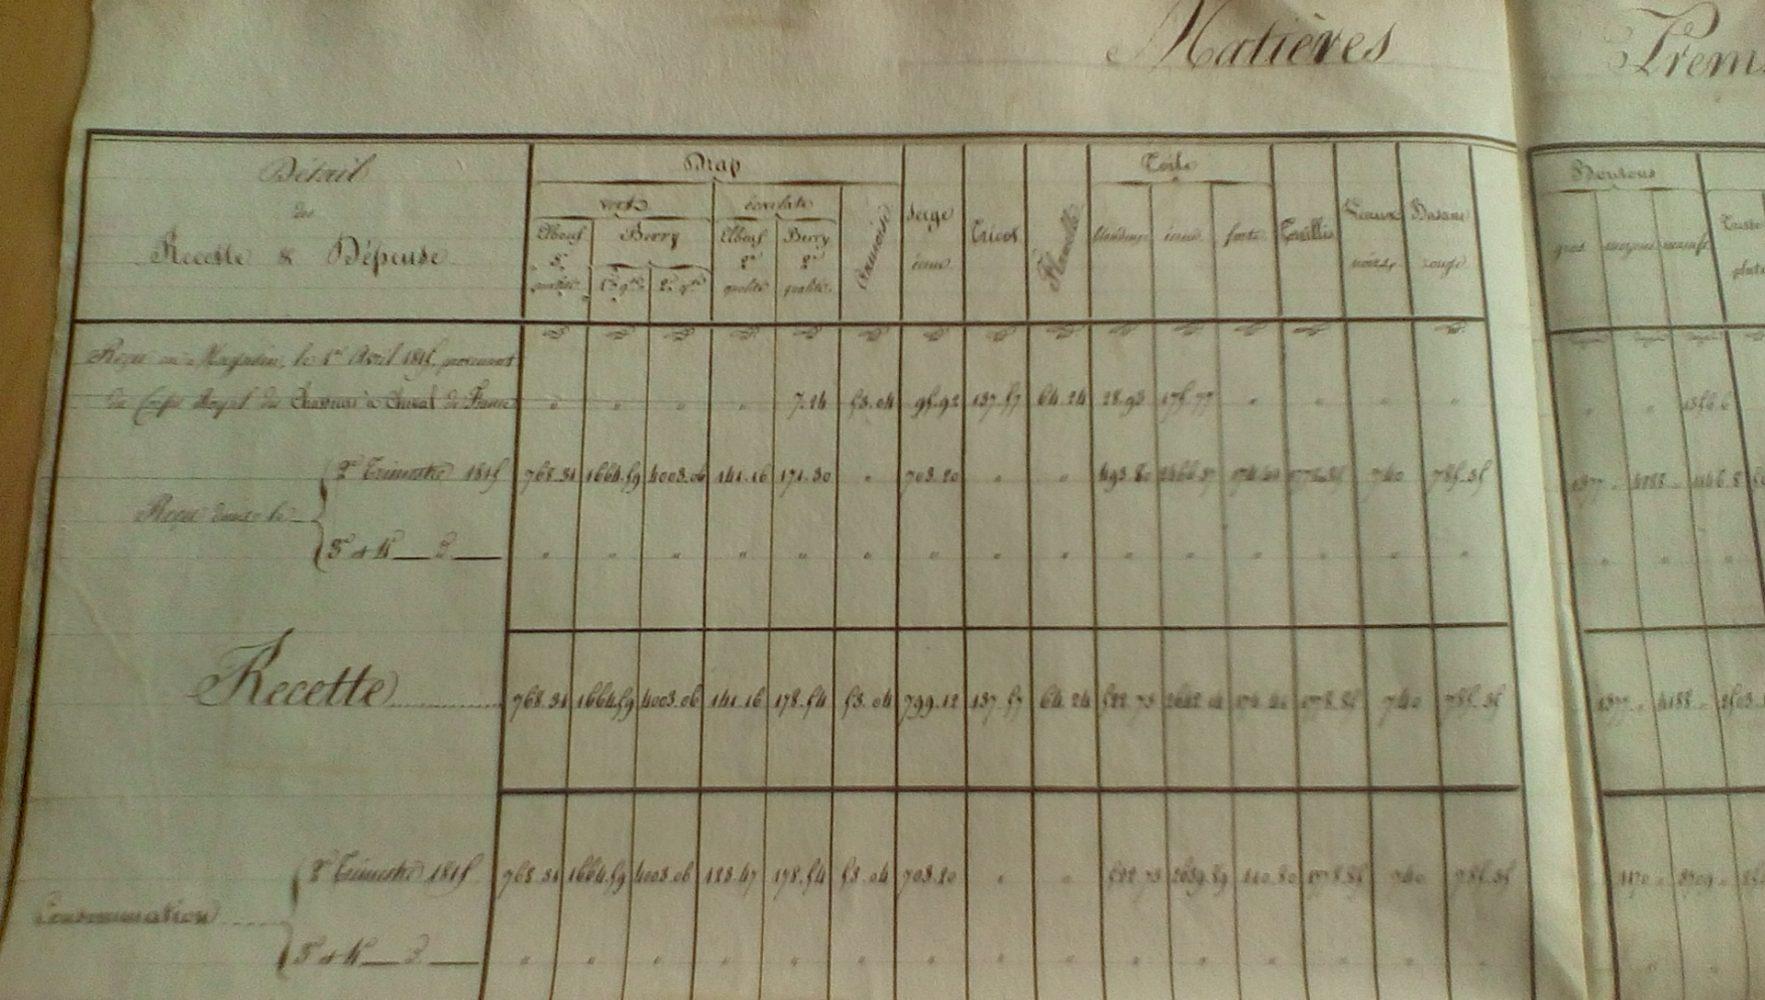 NLA archive book data page 1